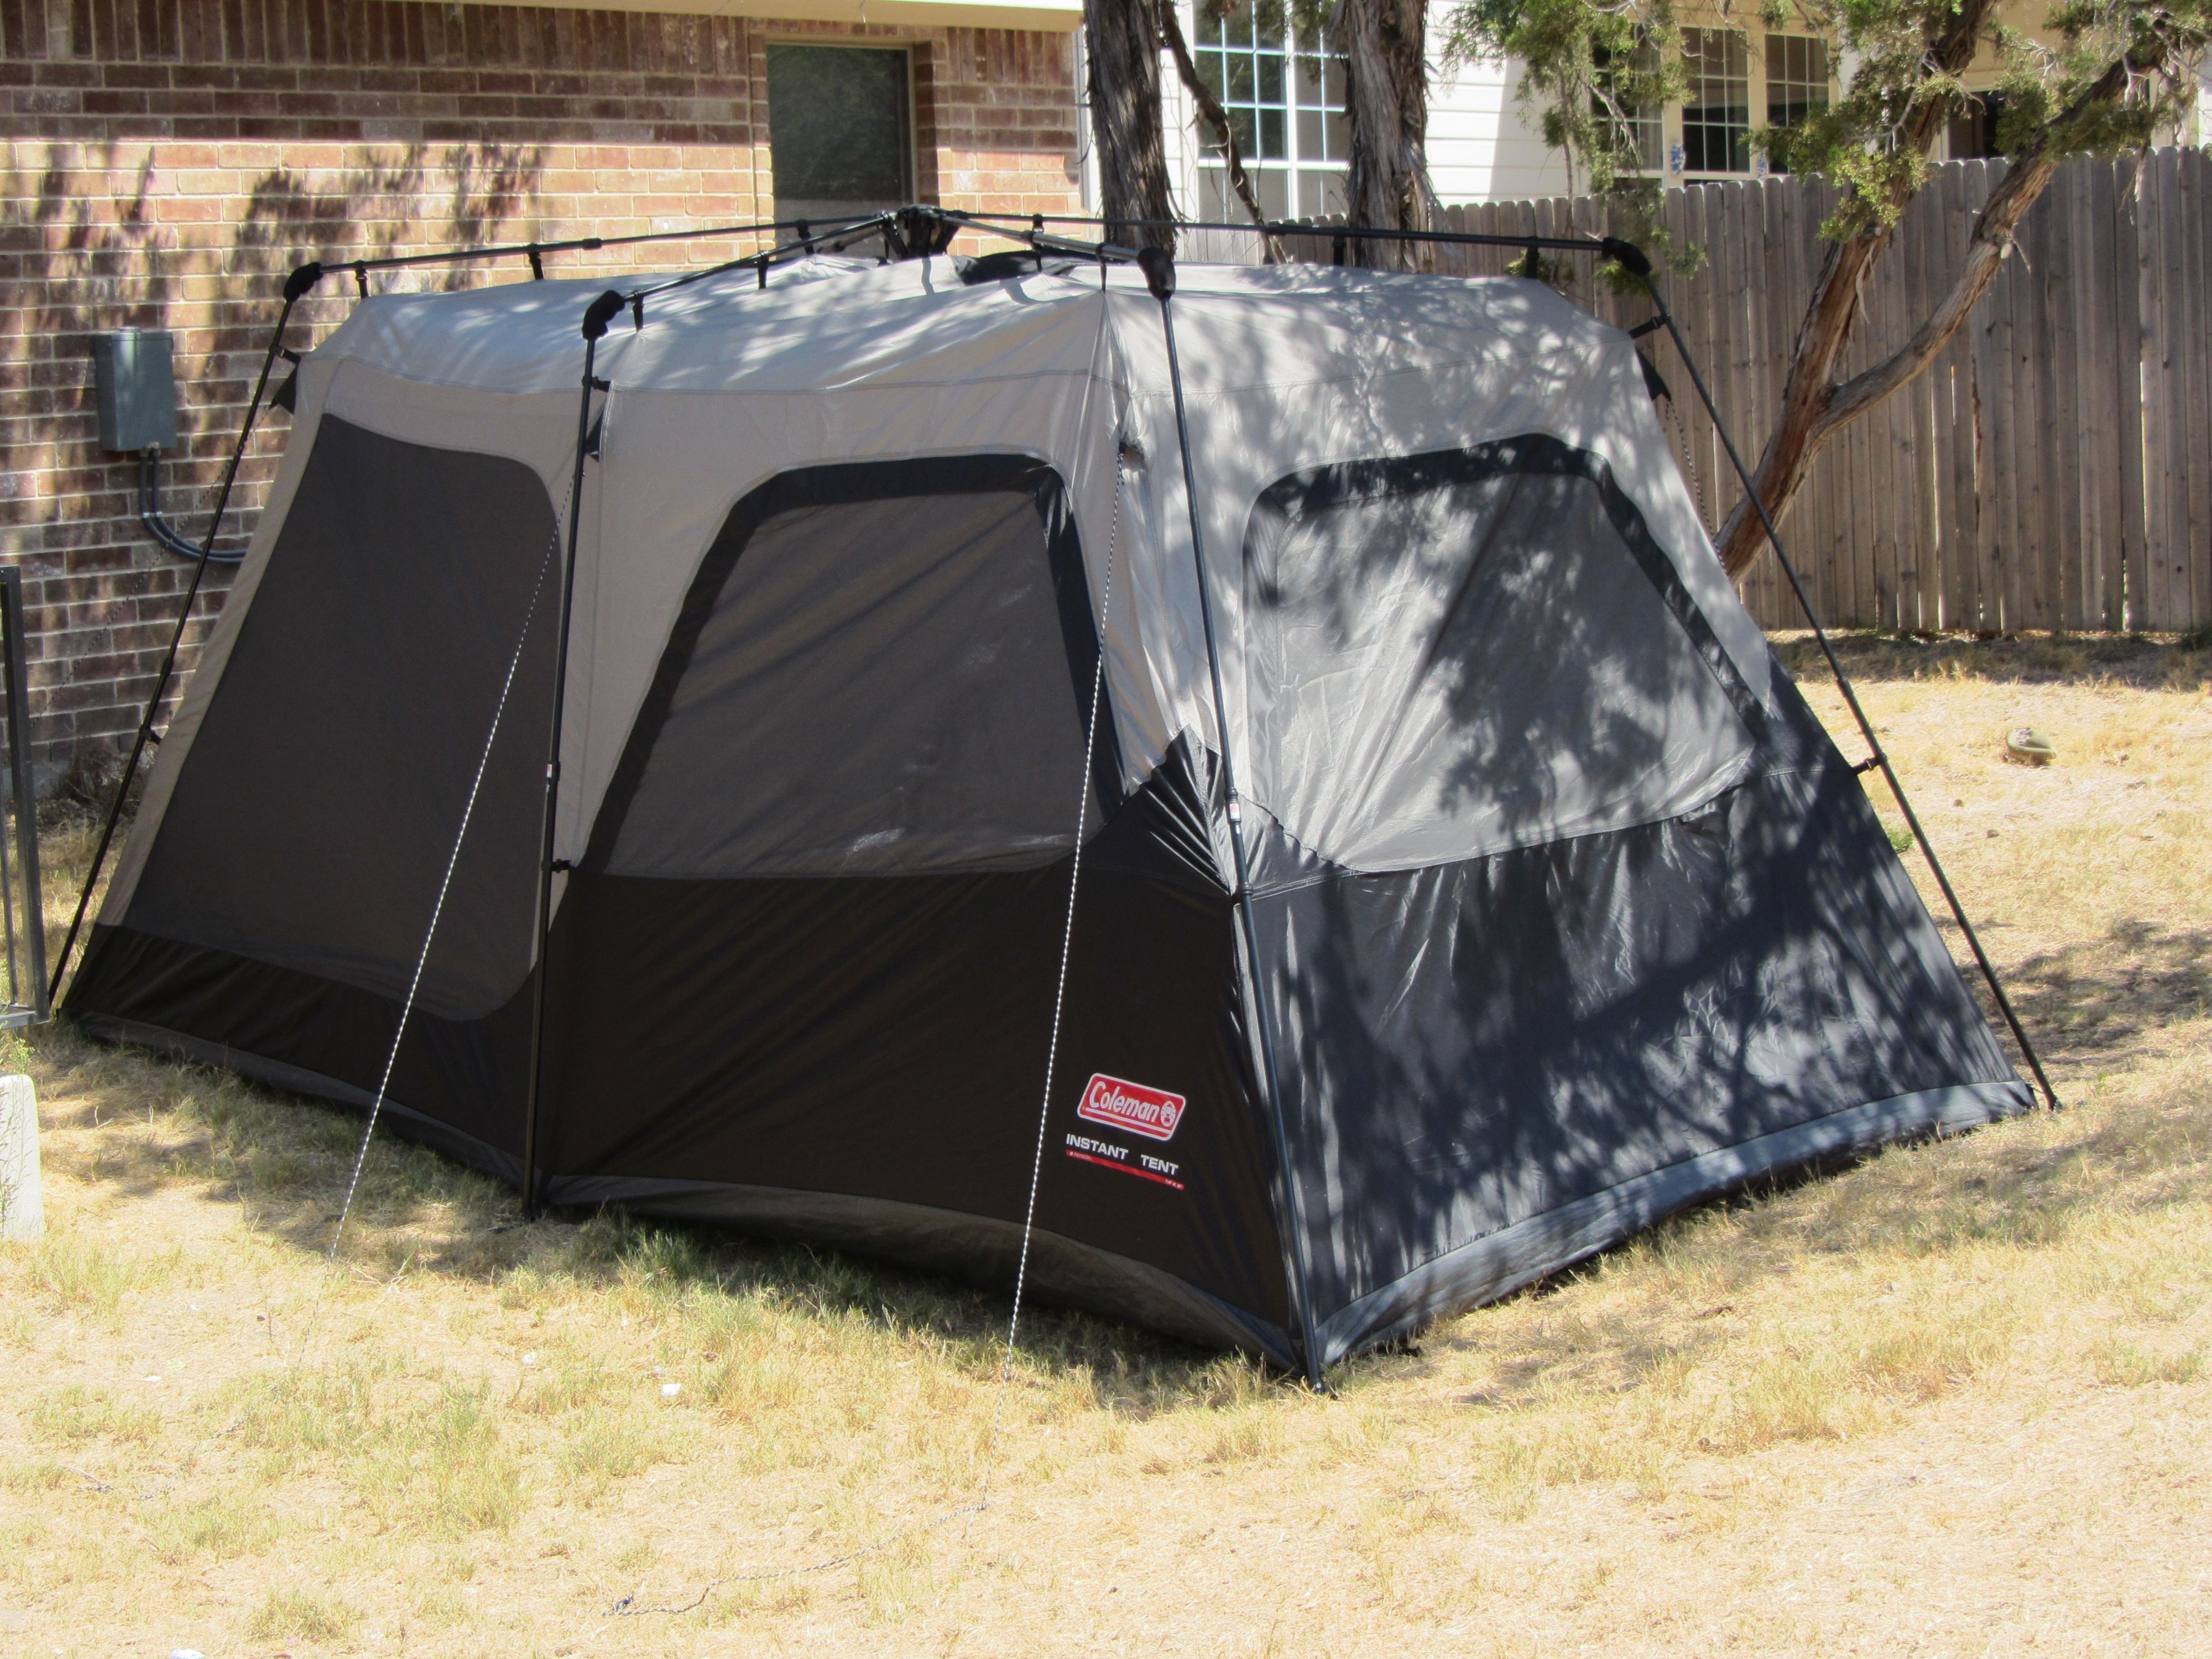 Coleman Instant Tent & Coleman Instant Tent | Great Family Tents | Pinterest | Tents